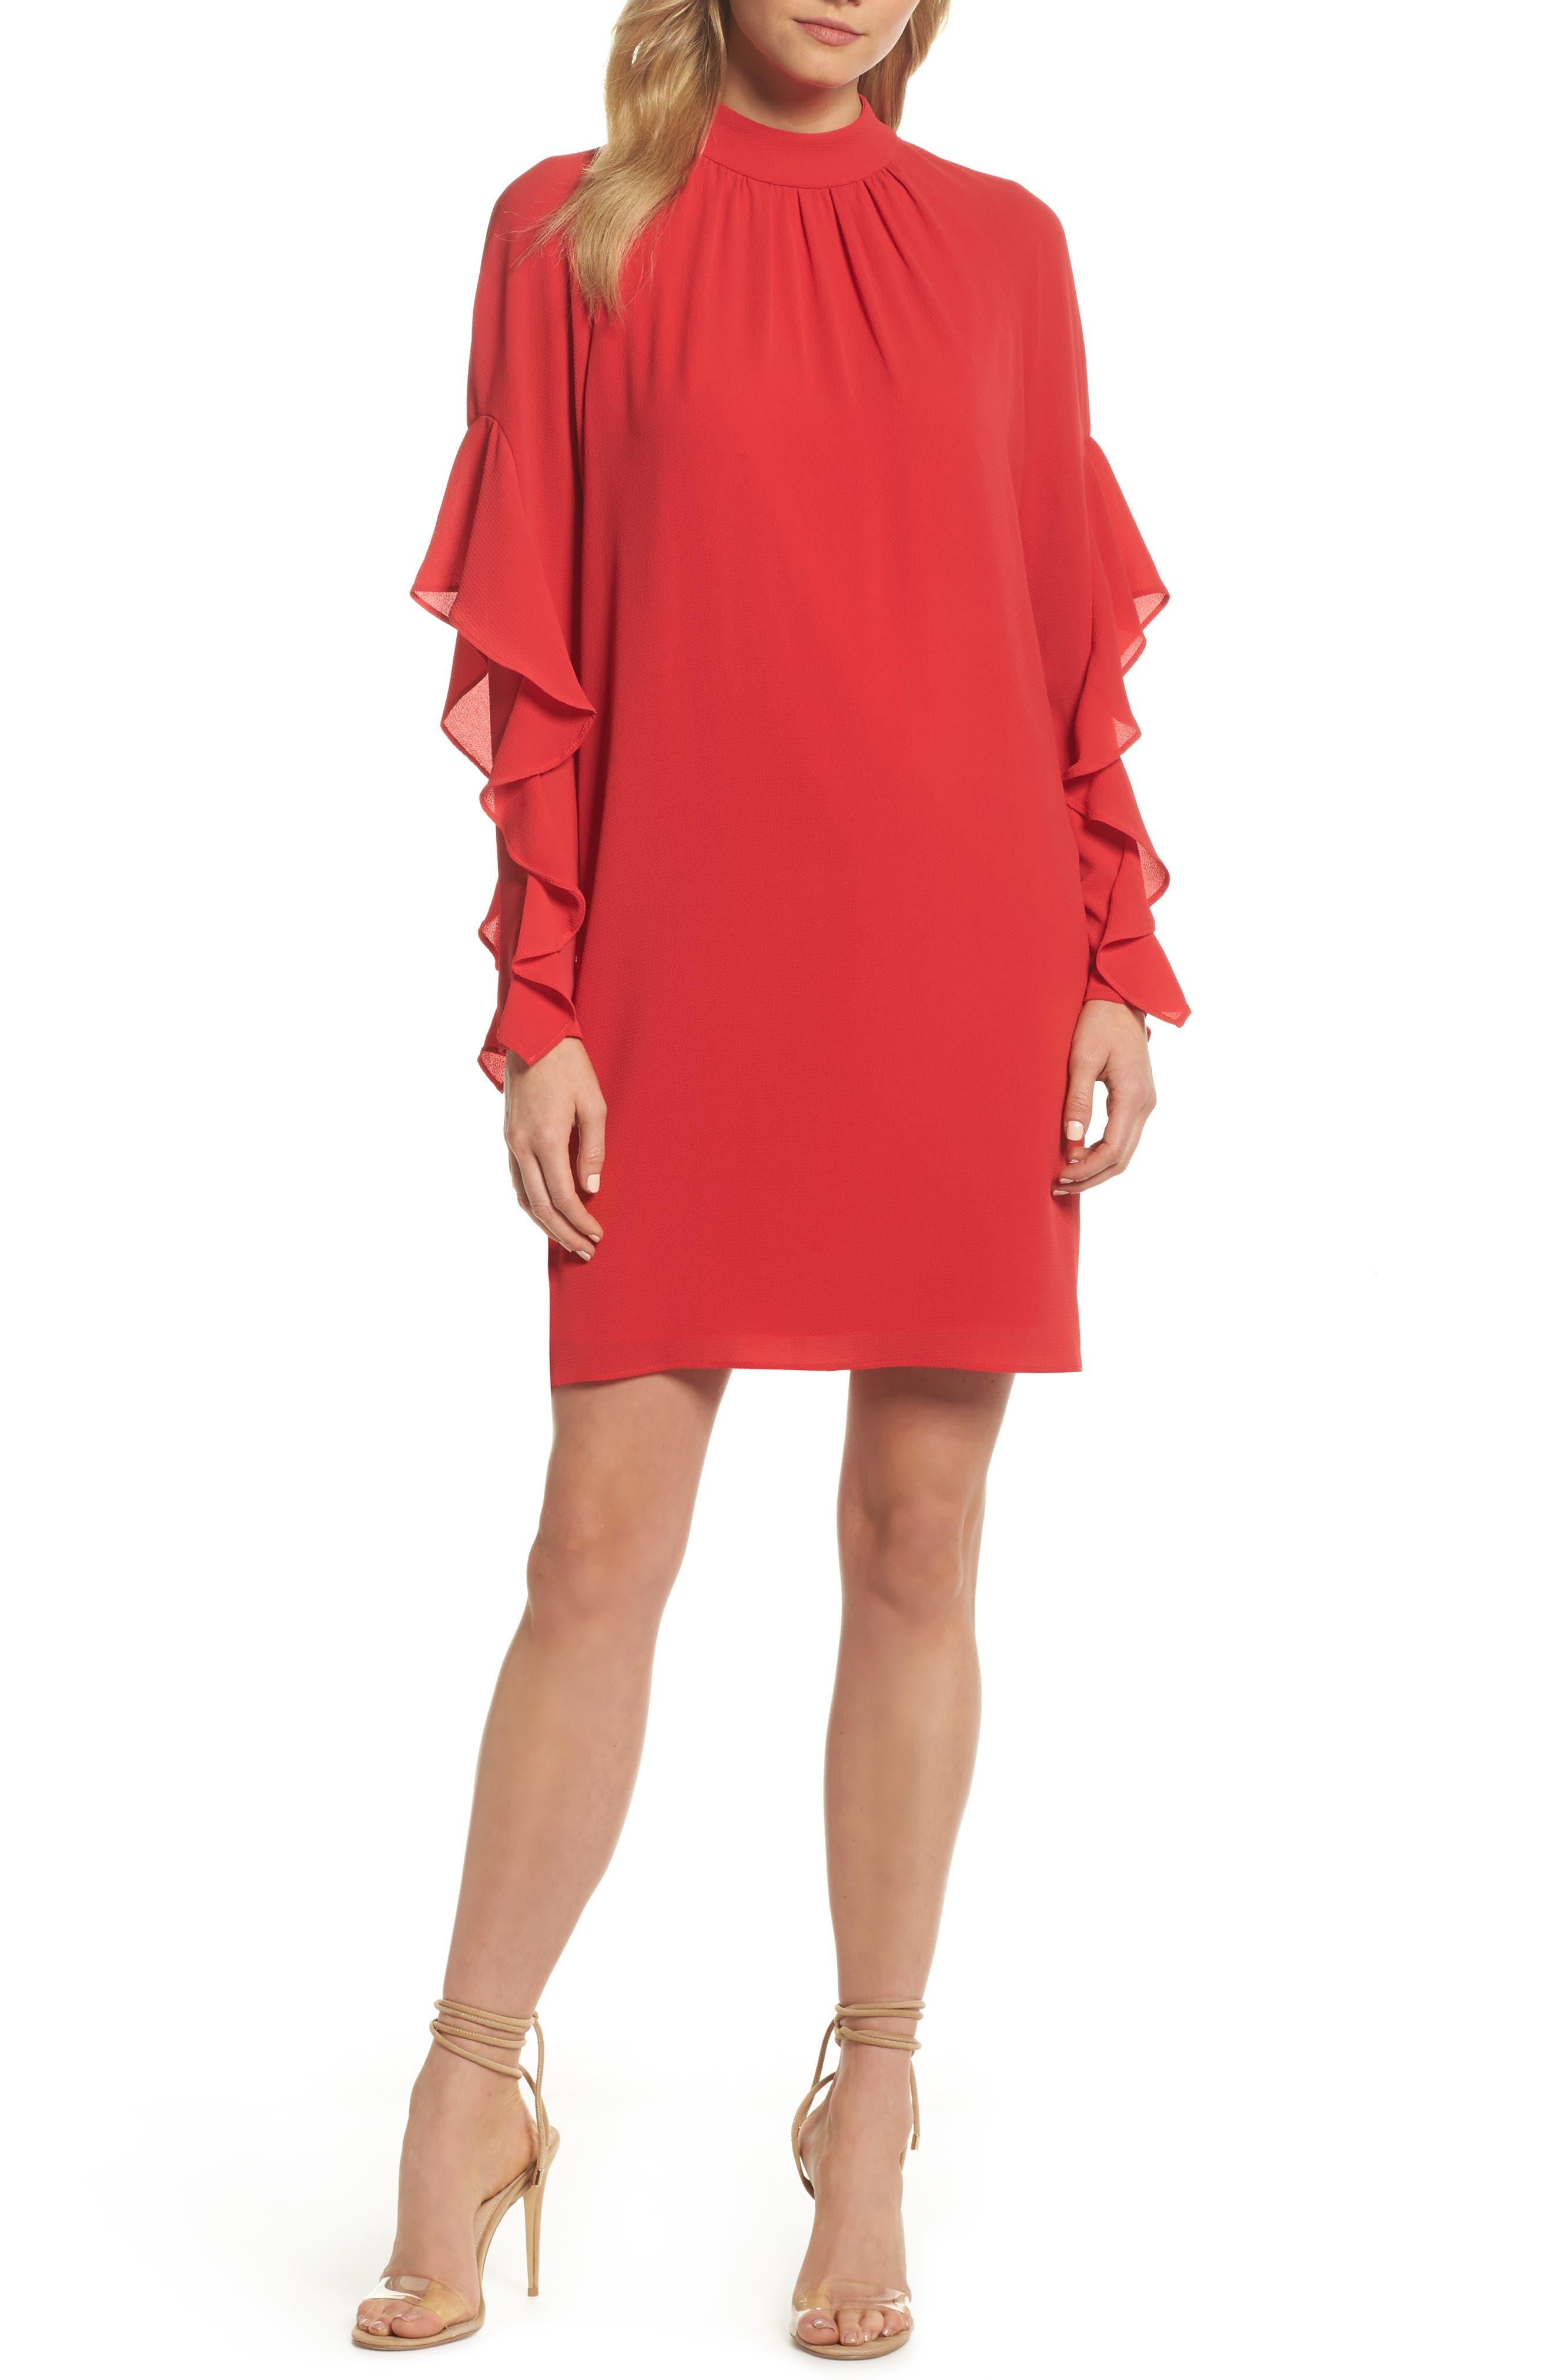 Catalina Ruffle Sleeve Dress,                             Main thumbnail 1, color,                             648